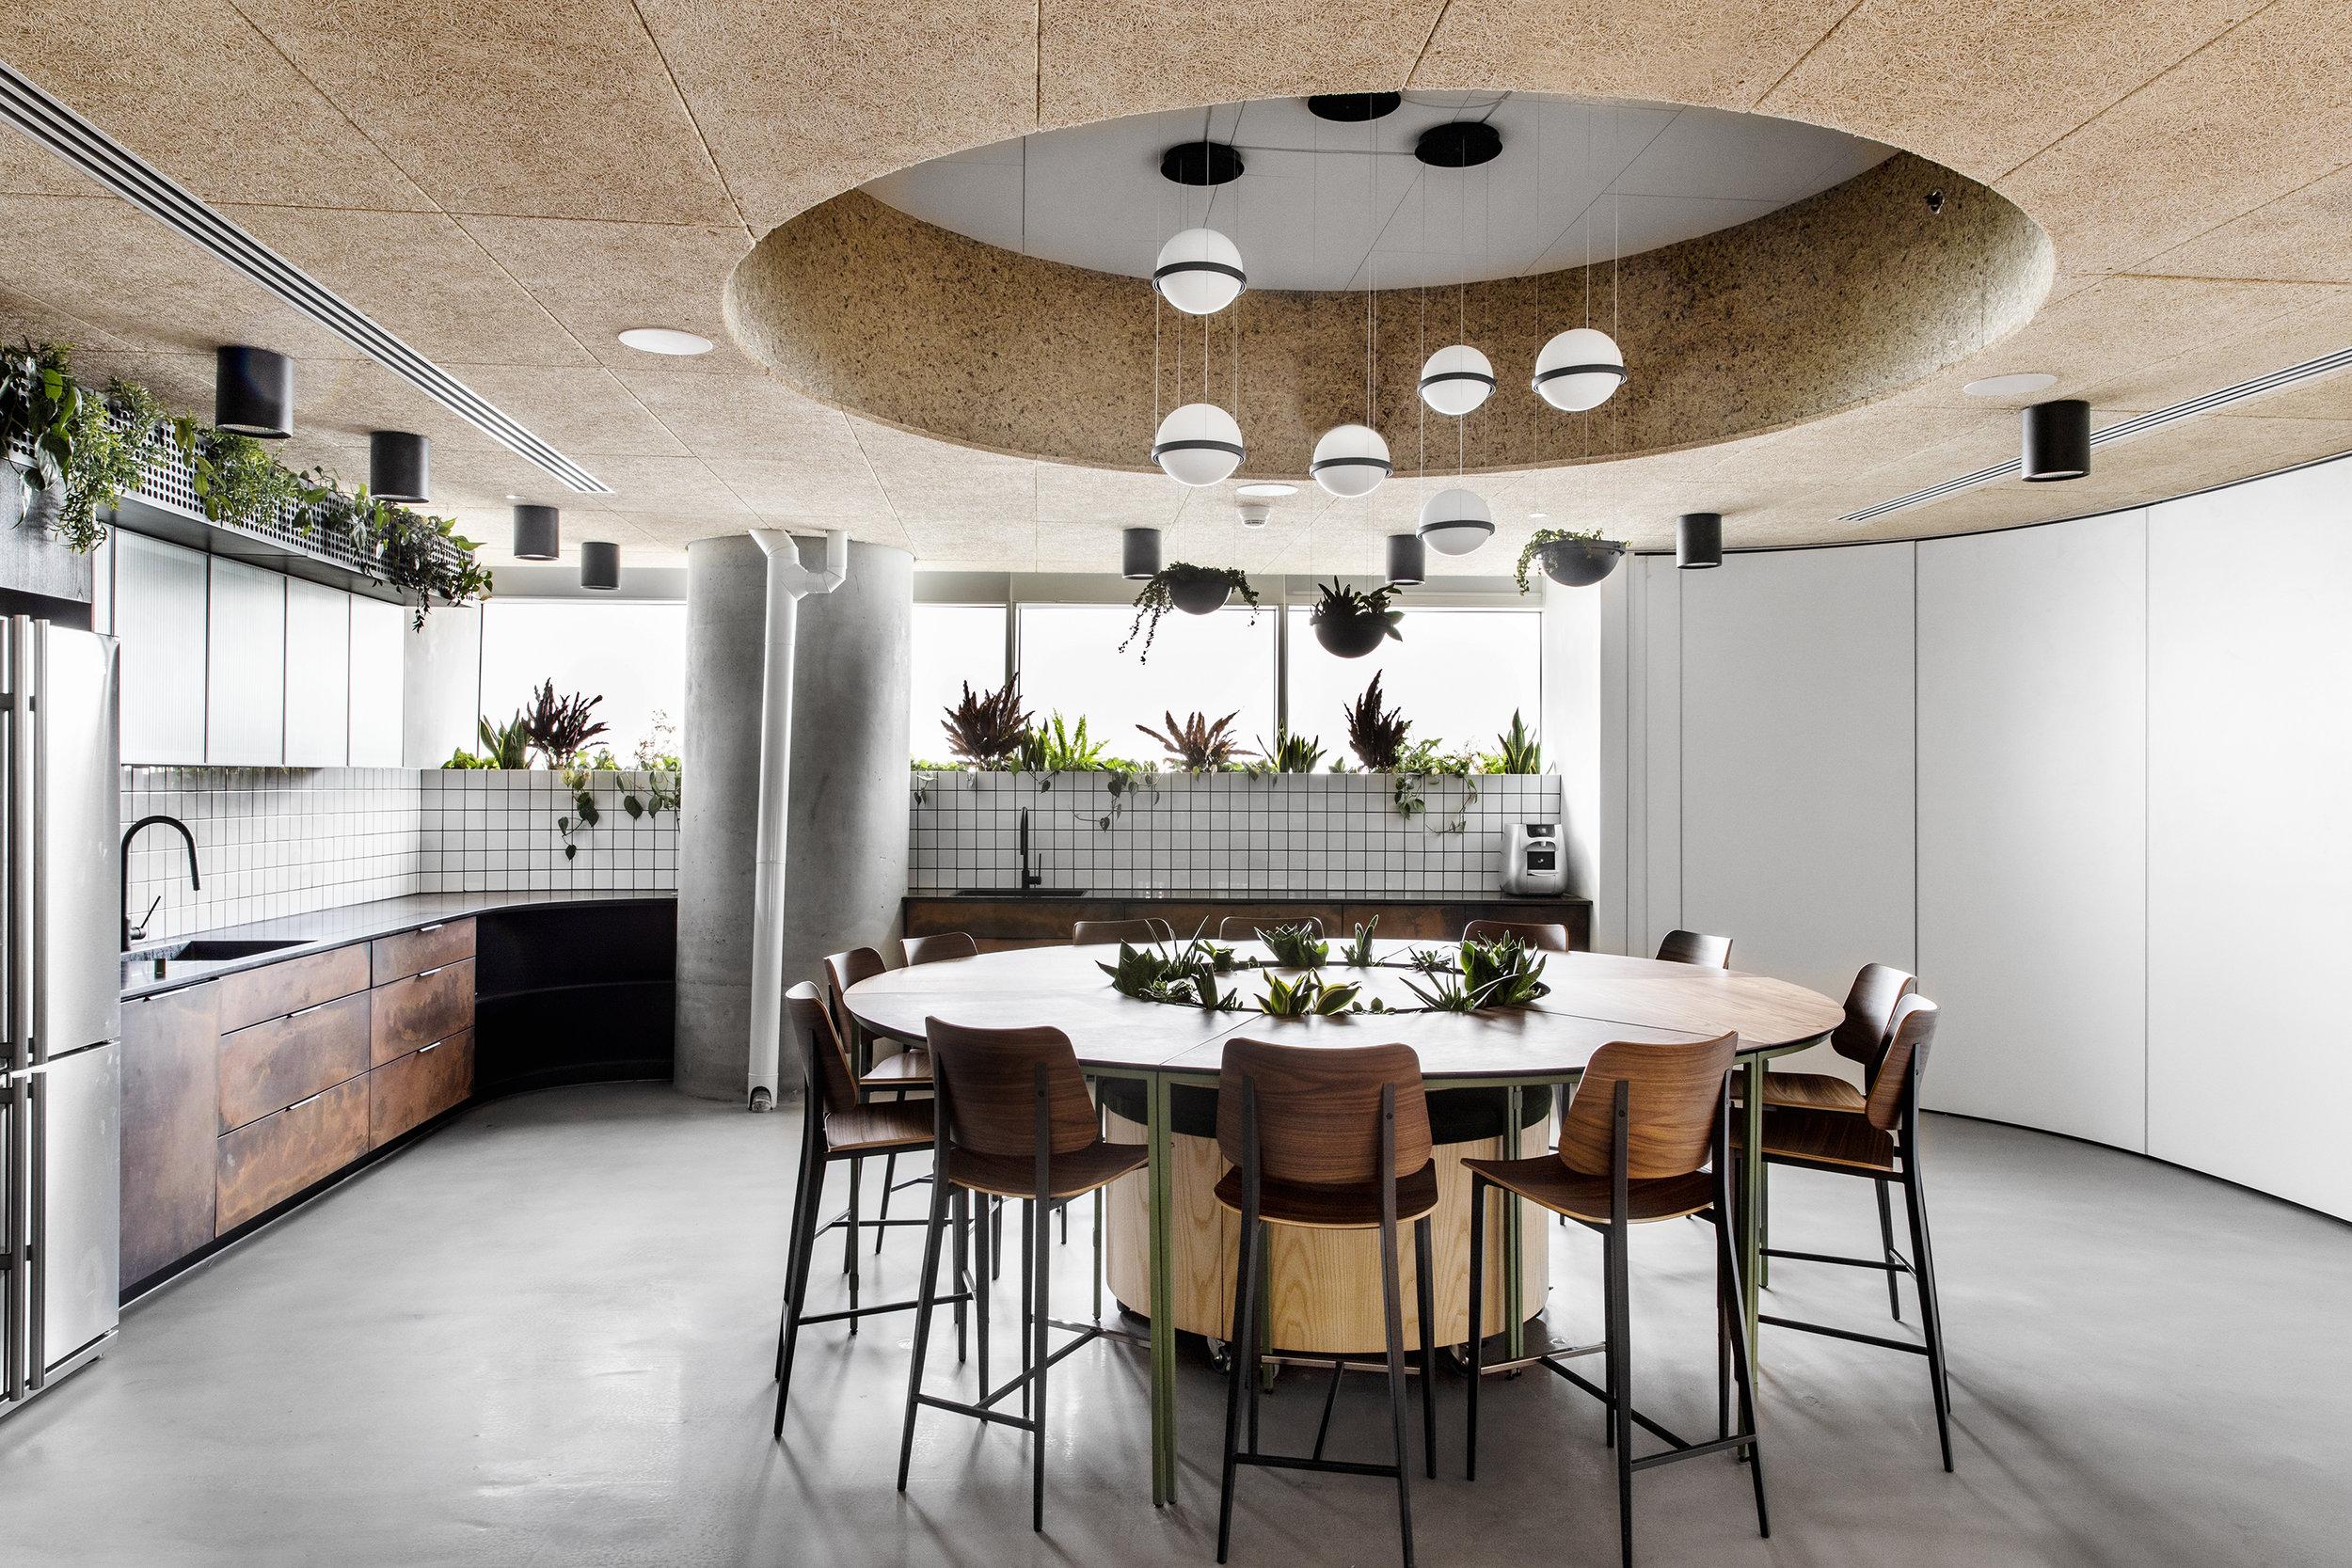 HINNOMAN - ROY DAVID ARCHTECTURE - STUDIO - סטודיו רואי דוד - אדריכלים (42).jpg